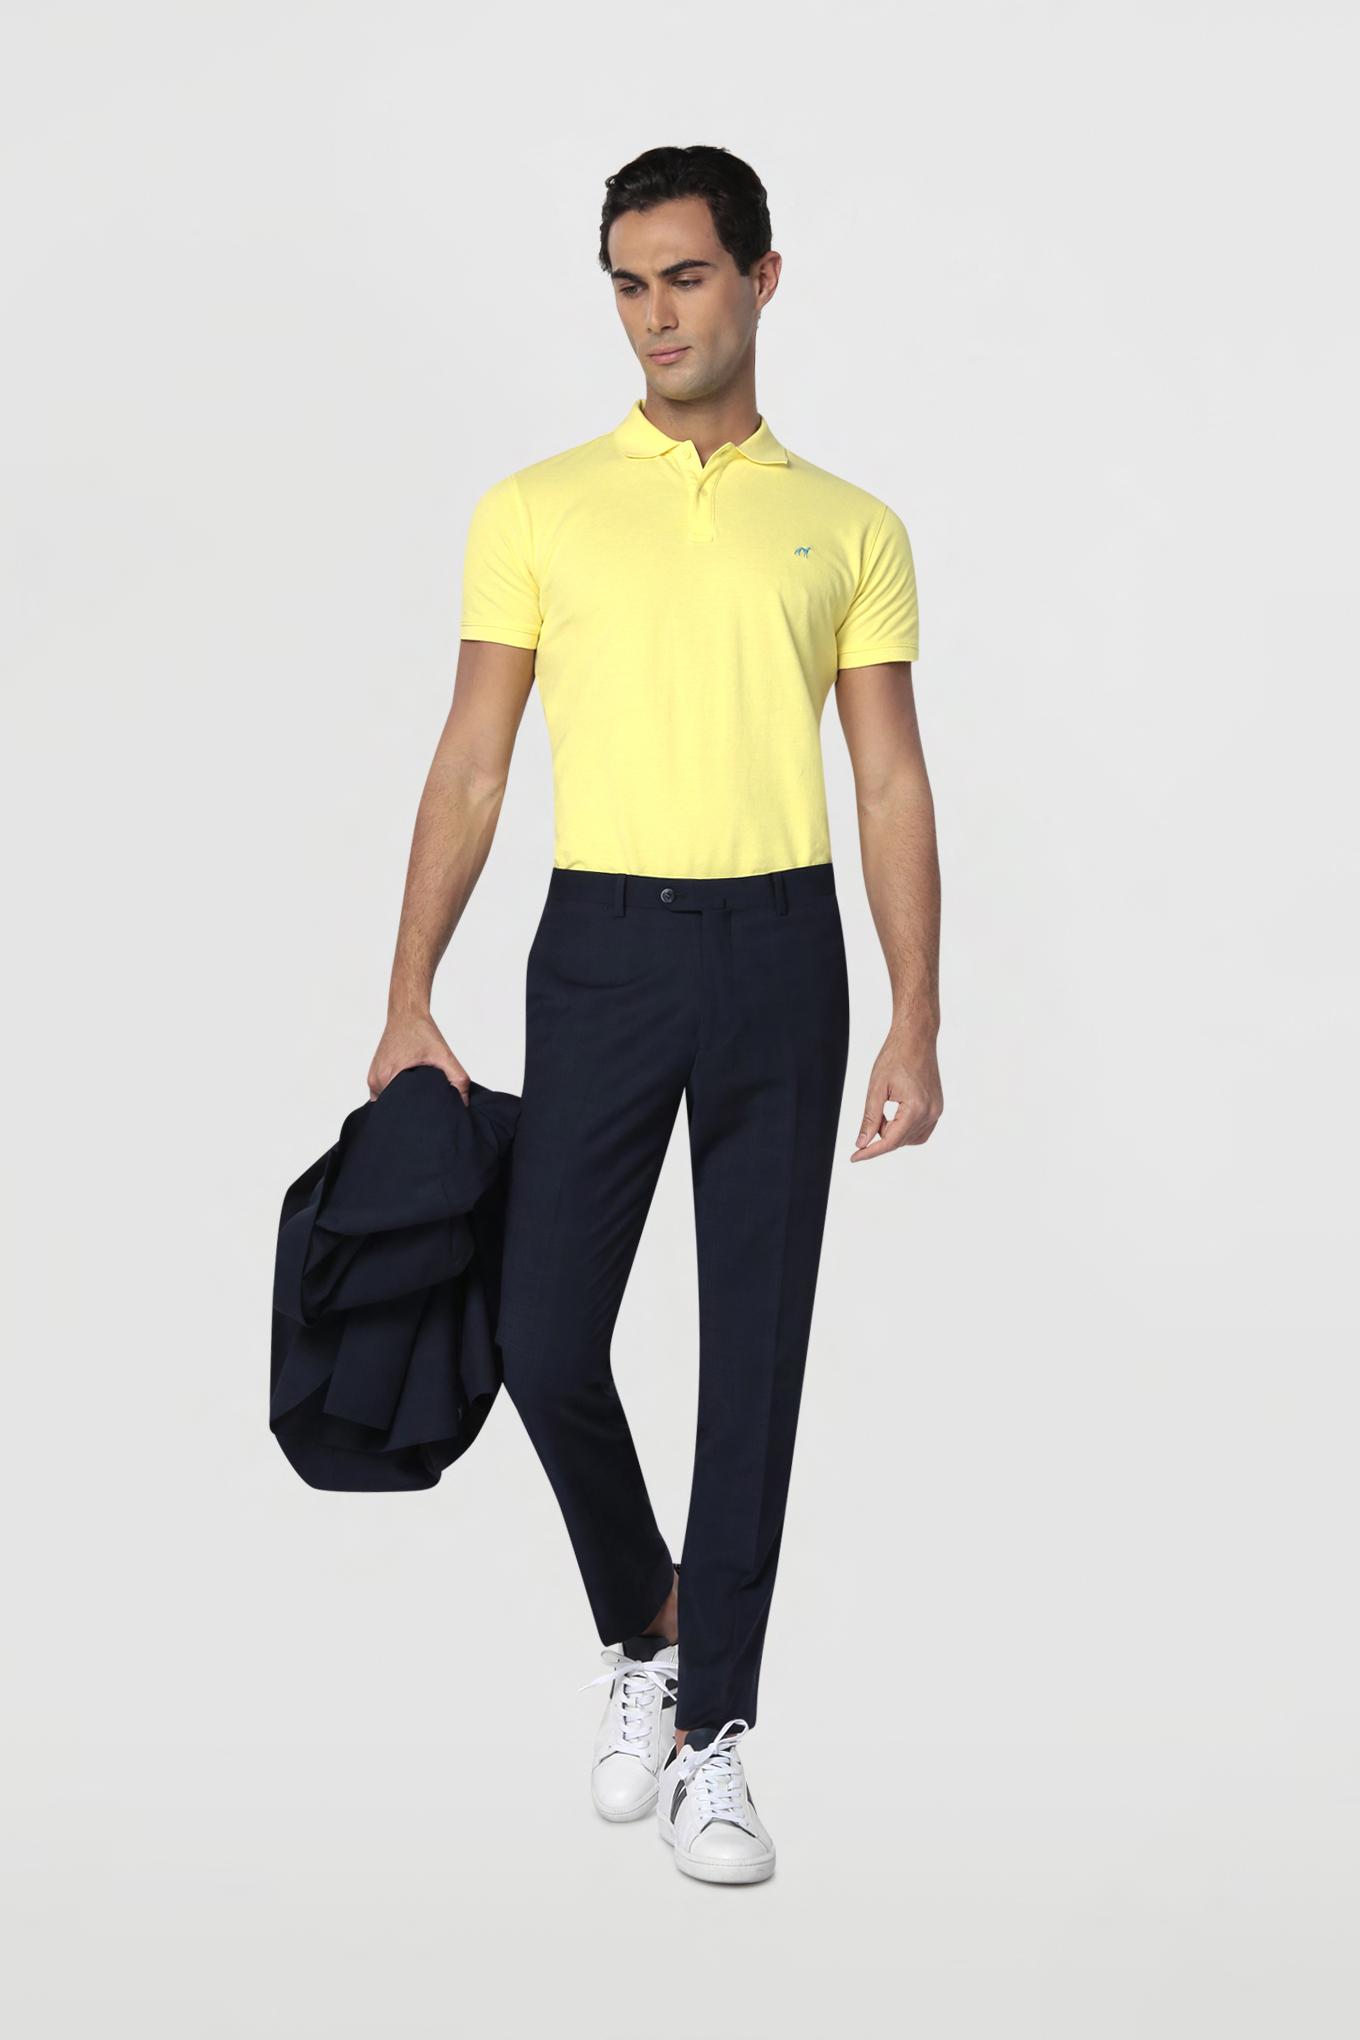 Polo Piquet Lemonade Sport Man